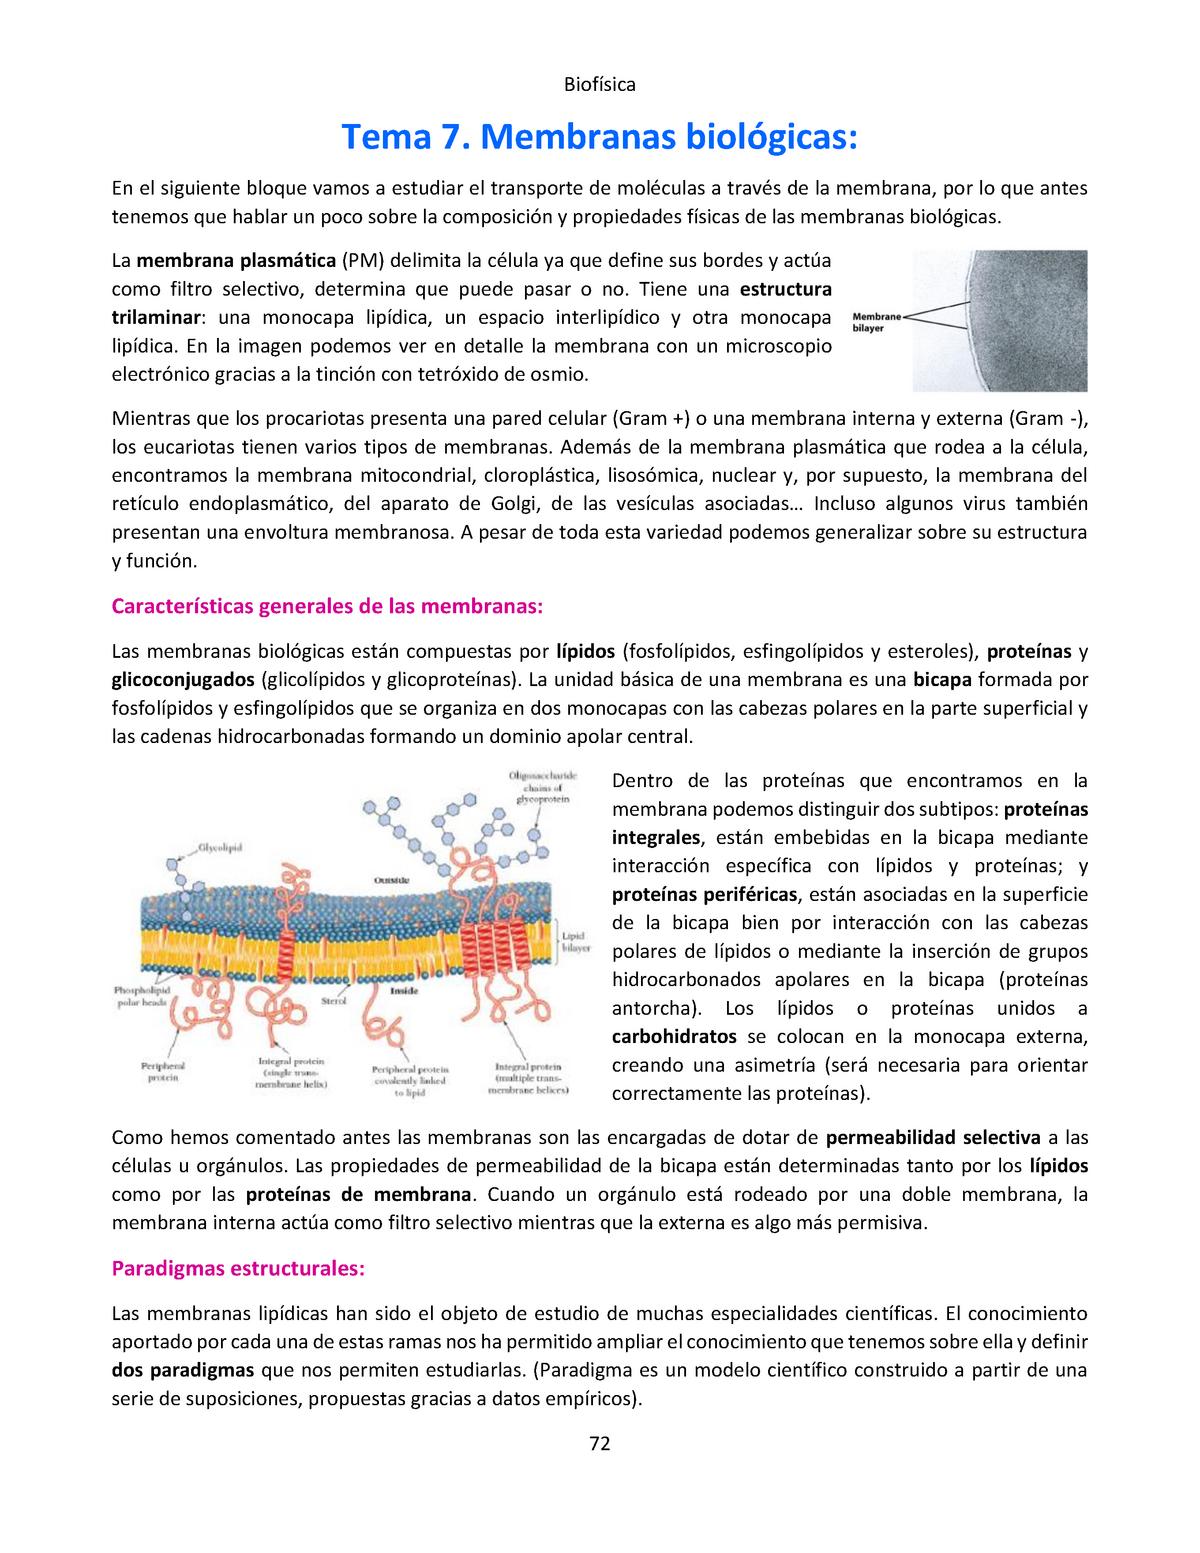 7 Membranas Biológicas Biofísica Upv Studocu